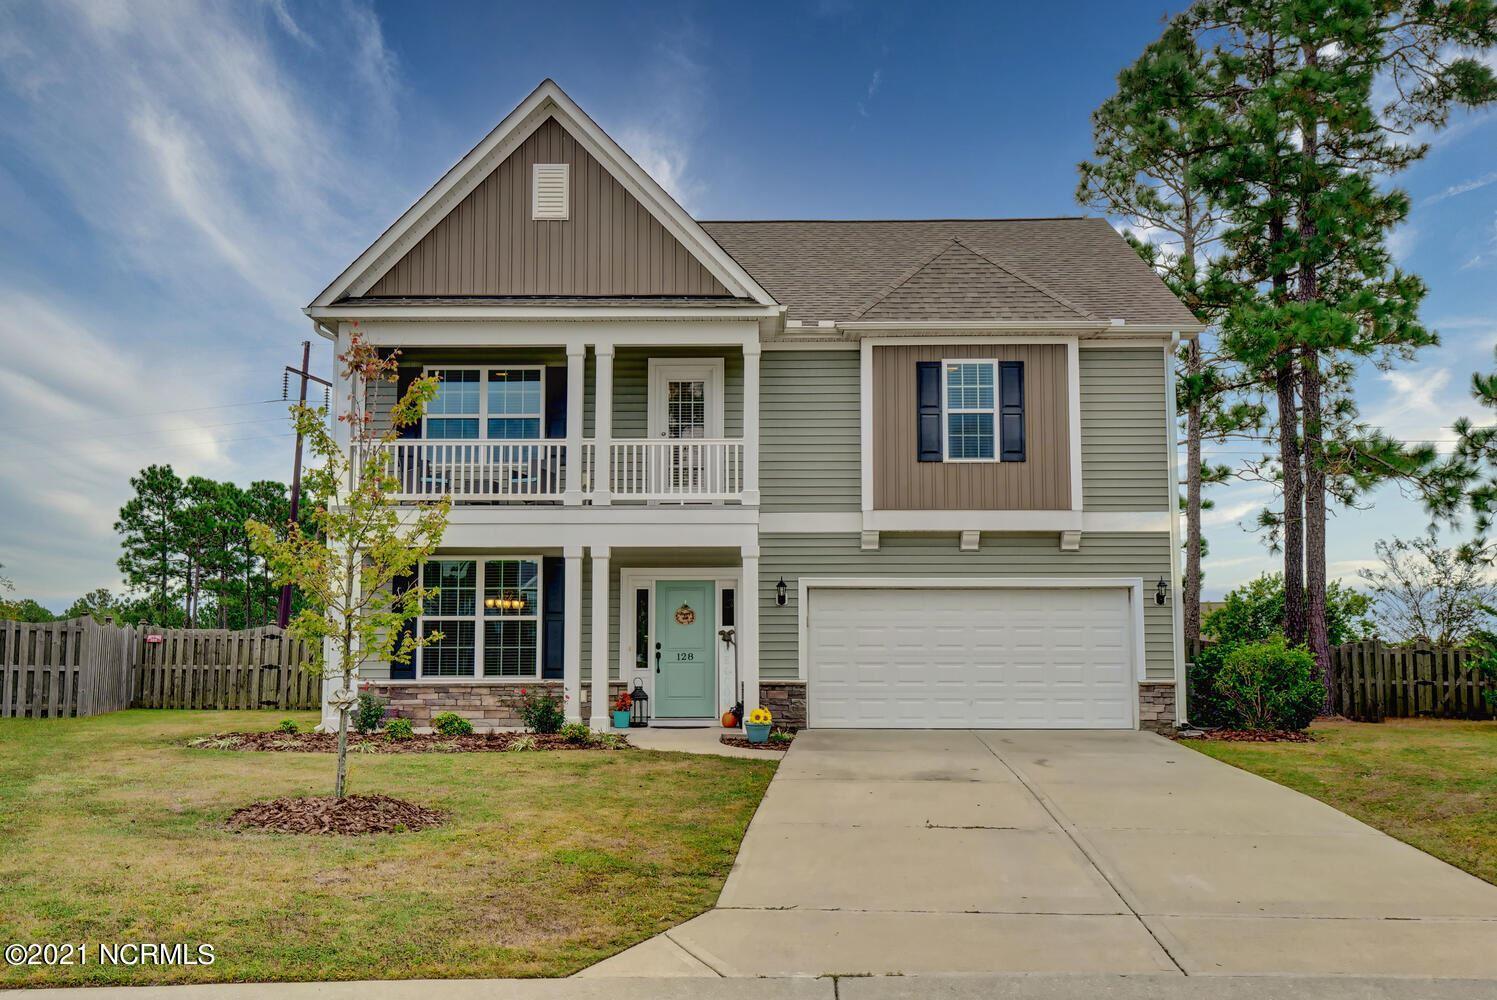 Photo of 128 Porch Swing Way, Holly Ridge, NC 28445 (MLS # 100295132)